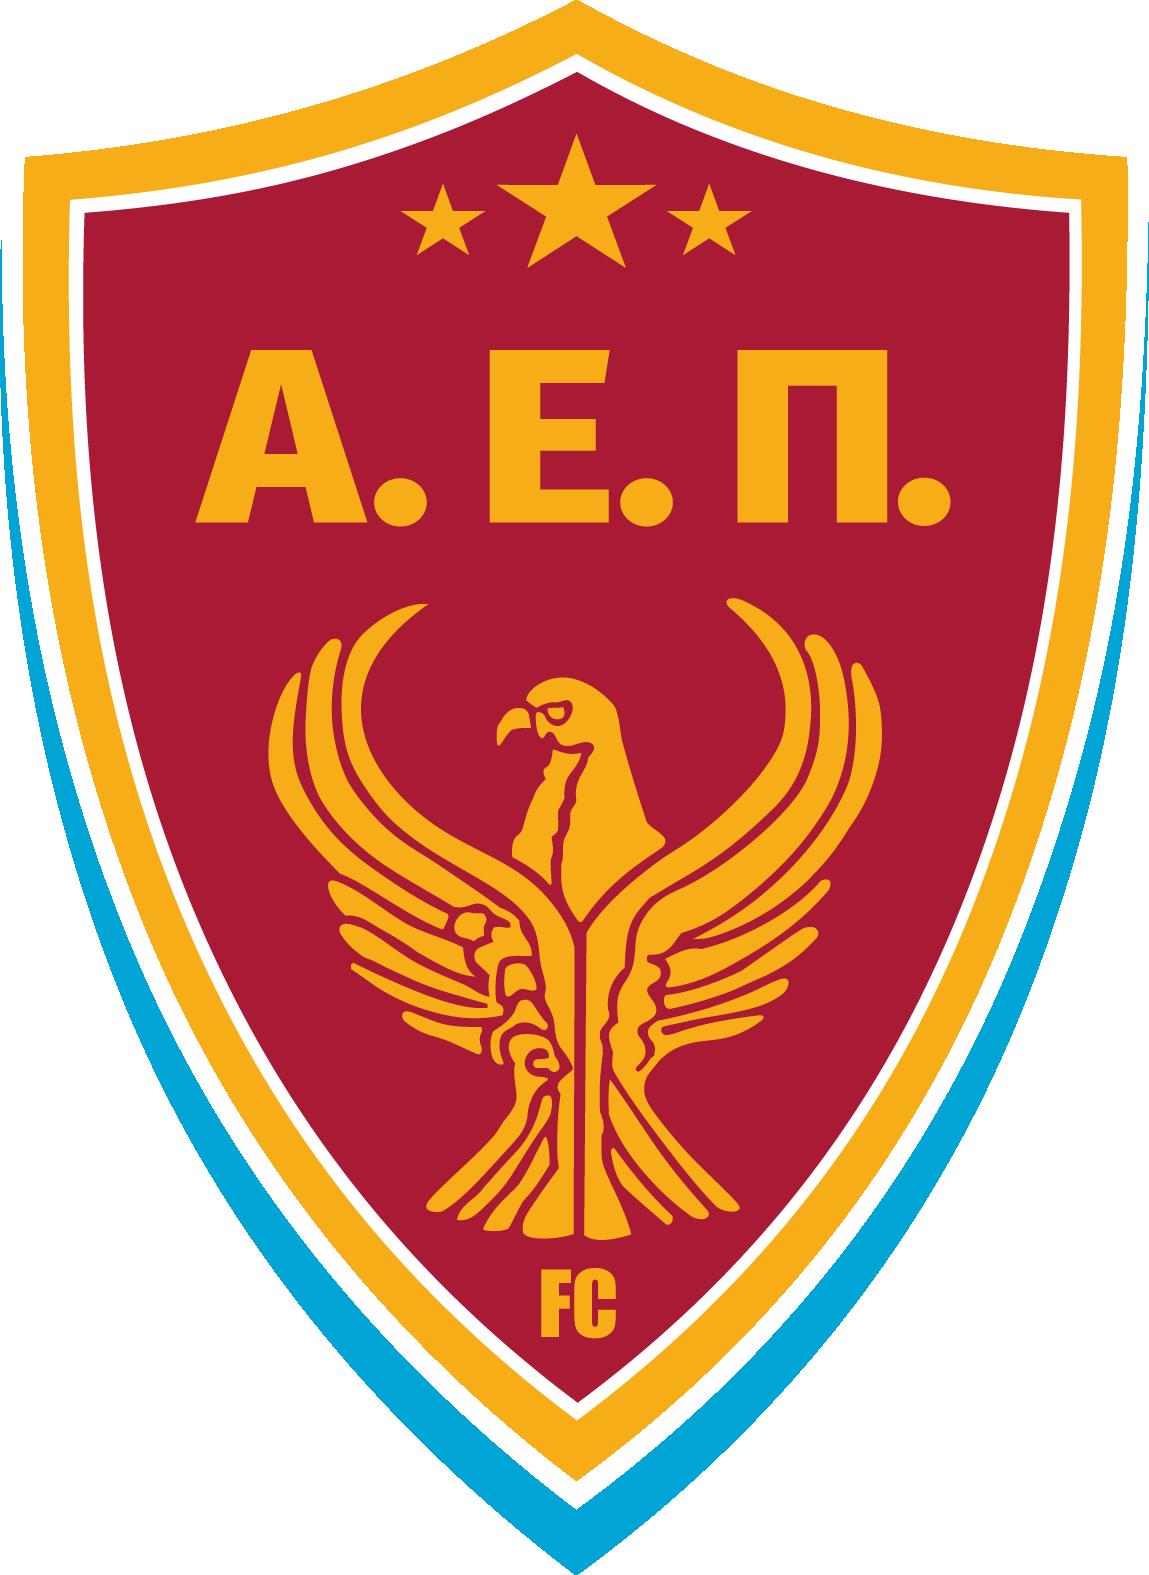 Aep Karagiannia Escudo Fútbol Futbol Soccer